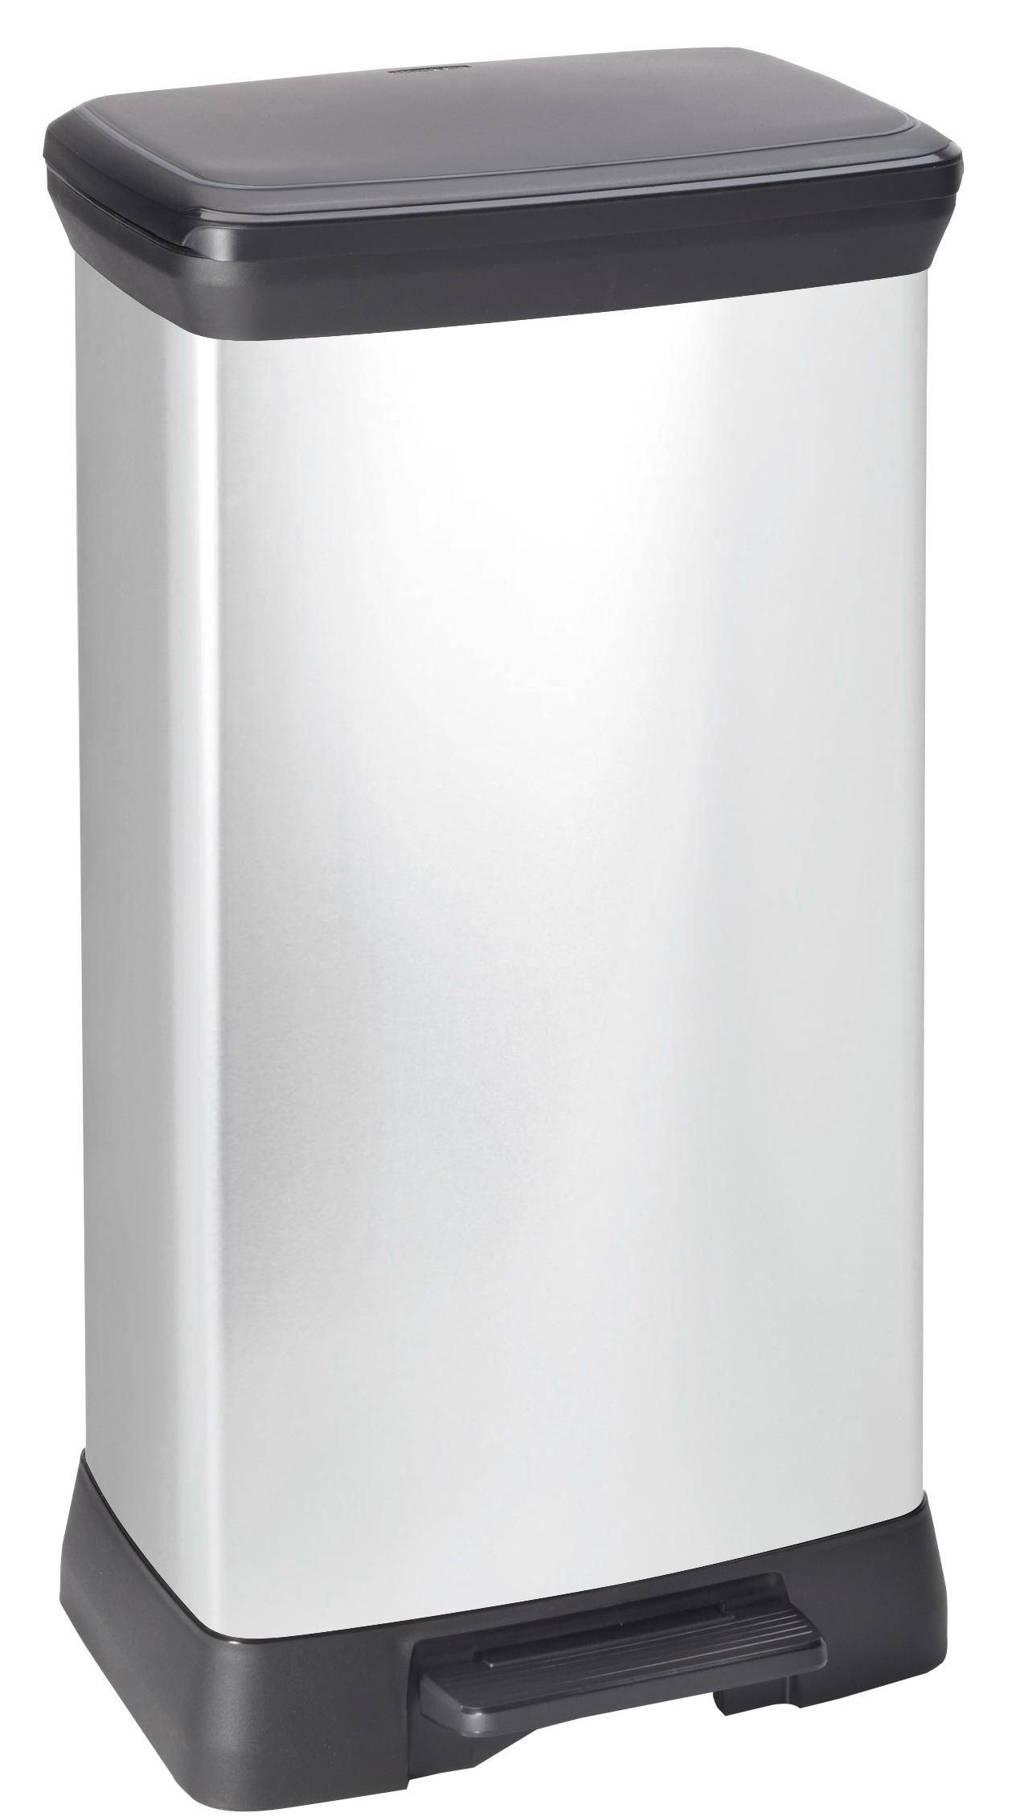 Curver Decobin 50 liter pedaalemmer, Zilver metallic/zwart